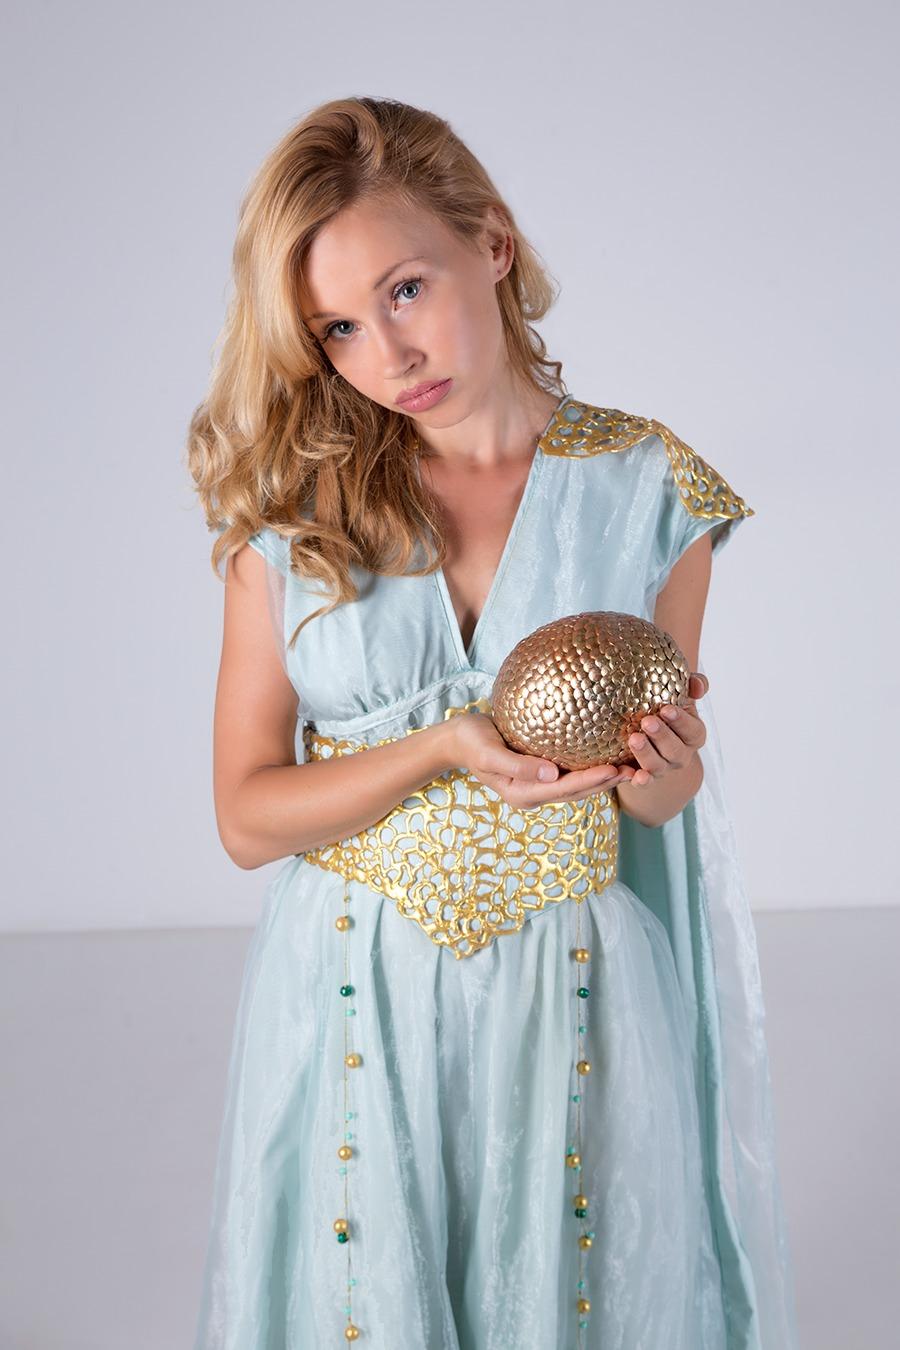 GOT the dress? / Photography by Stephen McHaffie, Stylist Bear MUA, Taken at Wolfe Cottage Studio, Designer Bear MUA / Uploaded 3rd August 2018 @ 07:14 AM